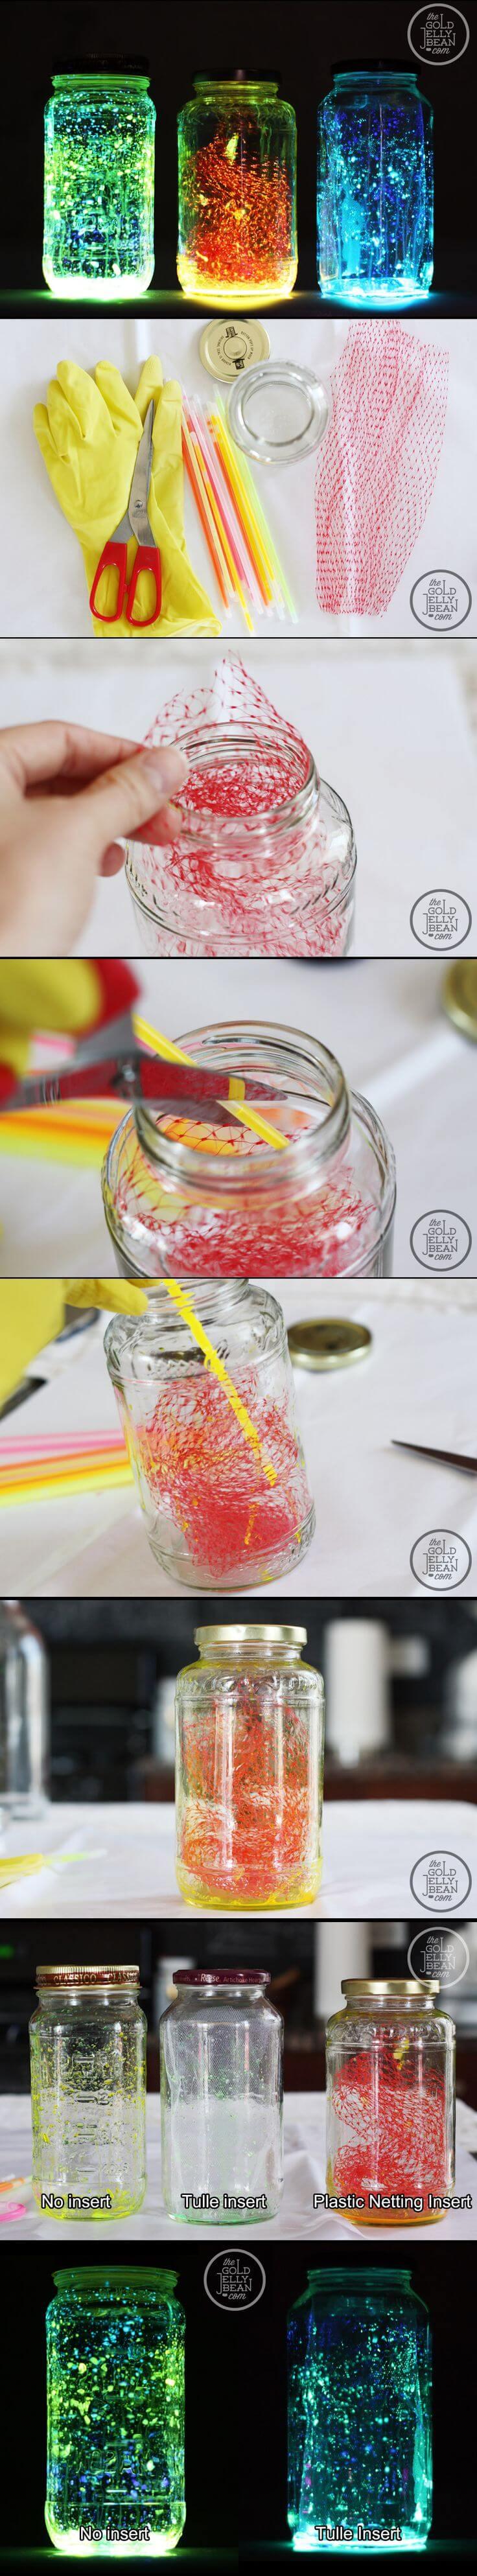 DIY Fairy Dust Jars are a Surefire Hit for Kids